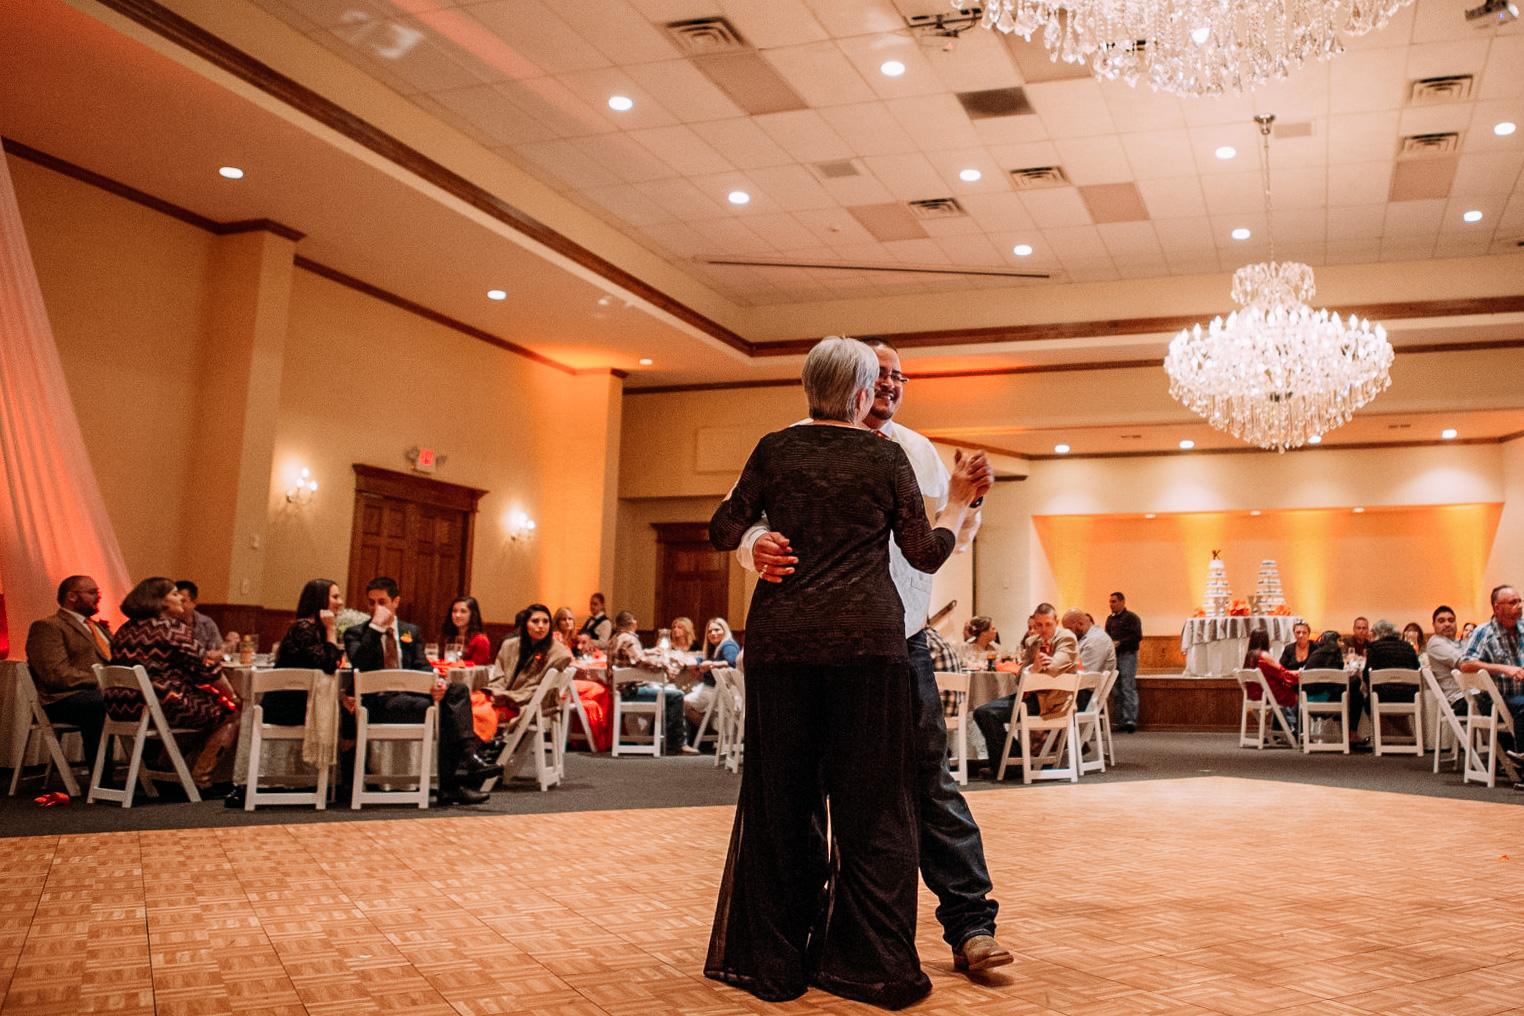 Documentary Wedding Photographer in Houston - Koehler Wedding-58.jpg